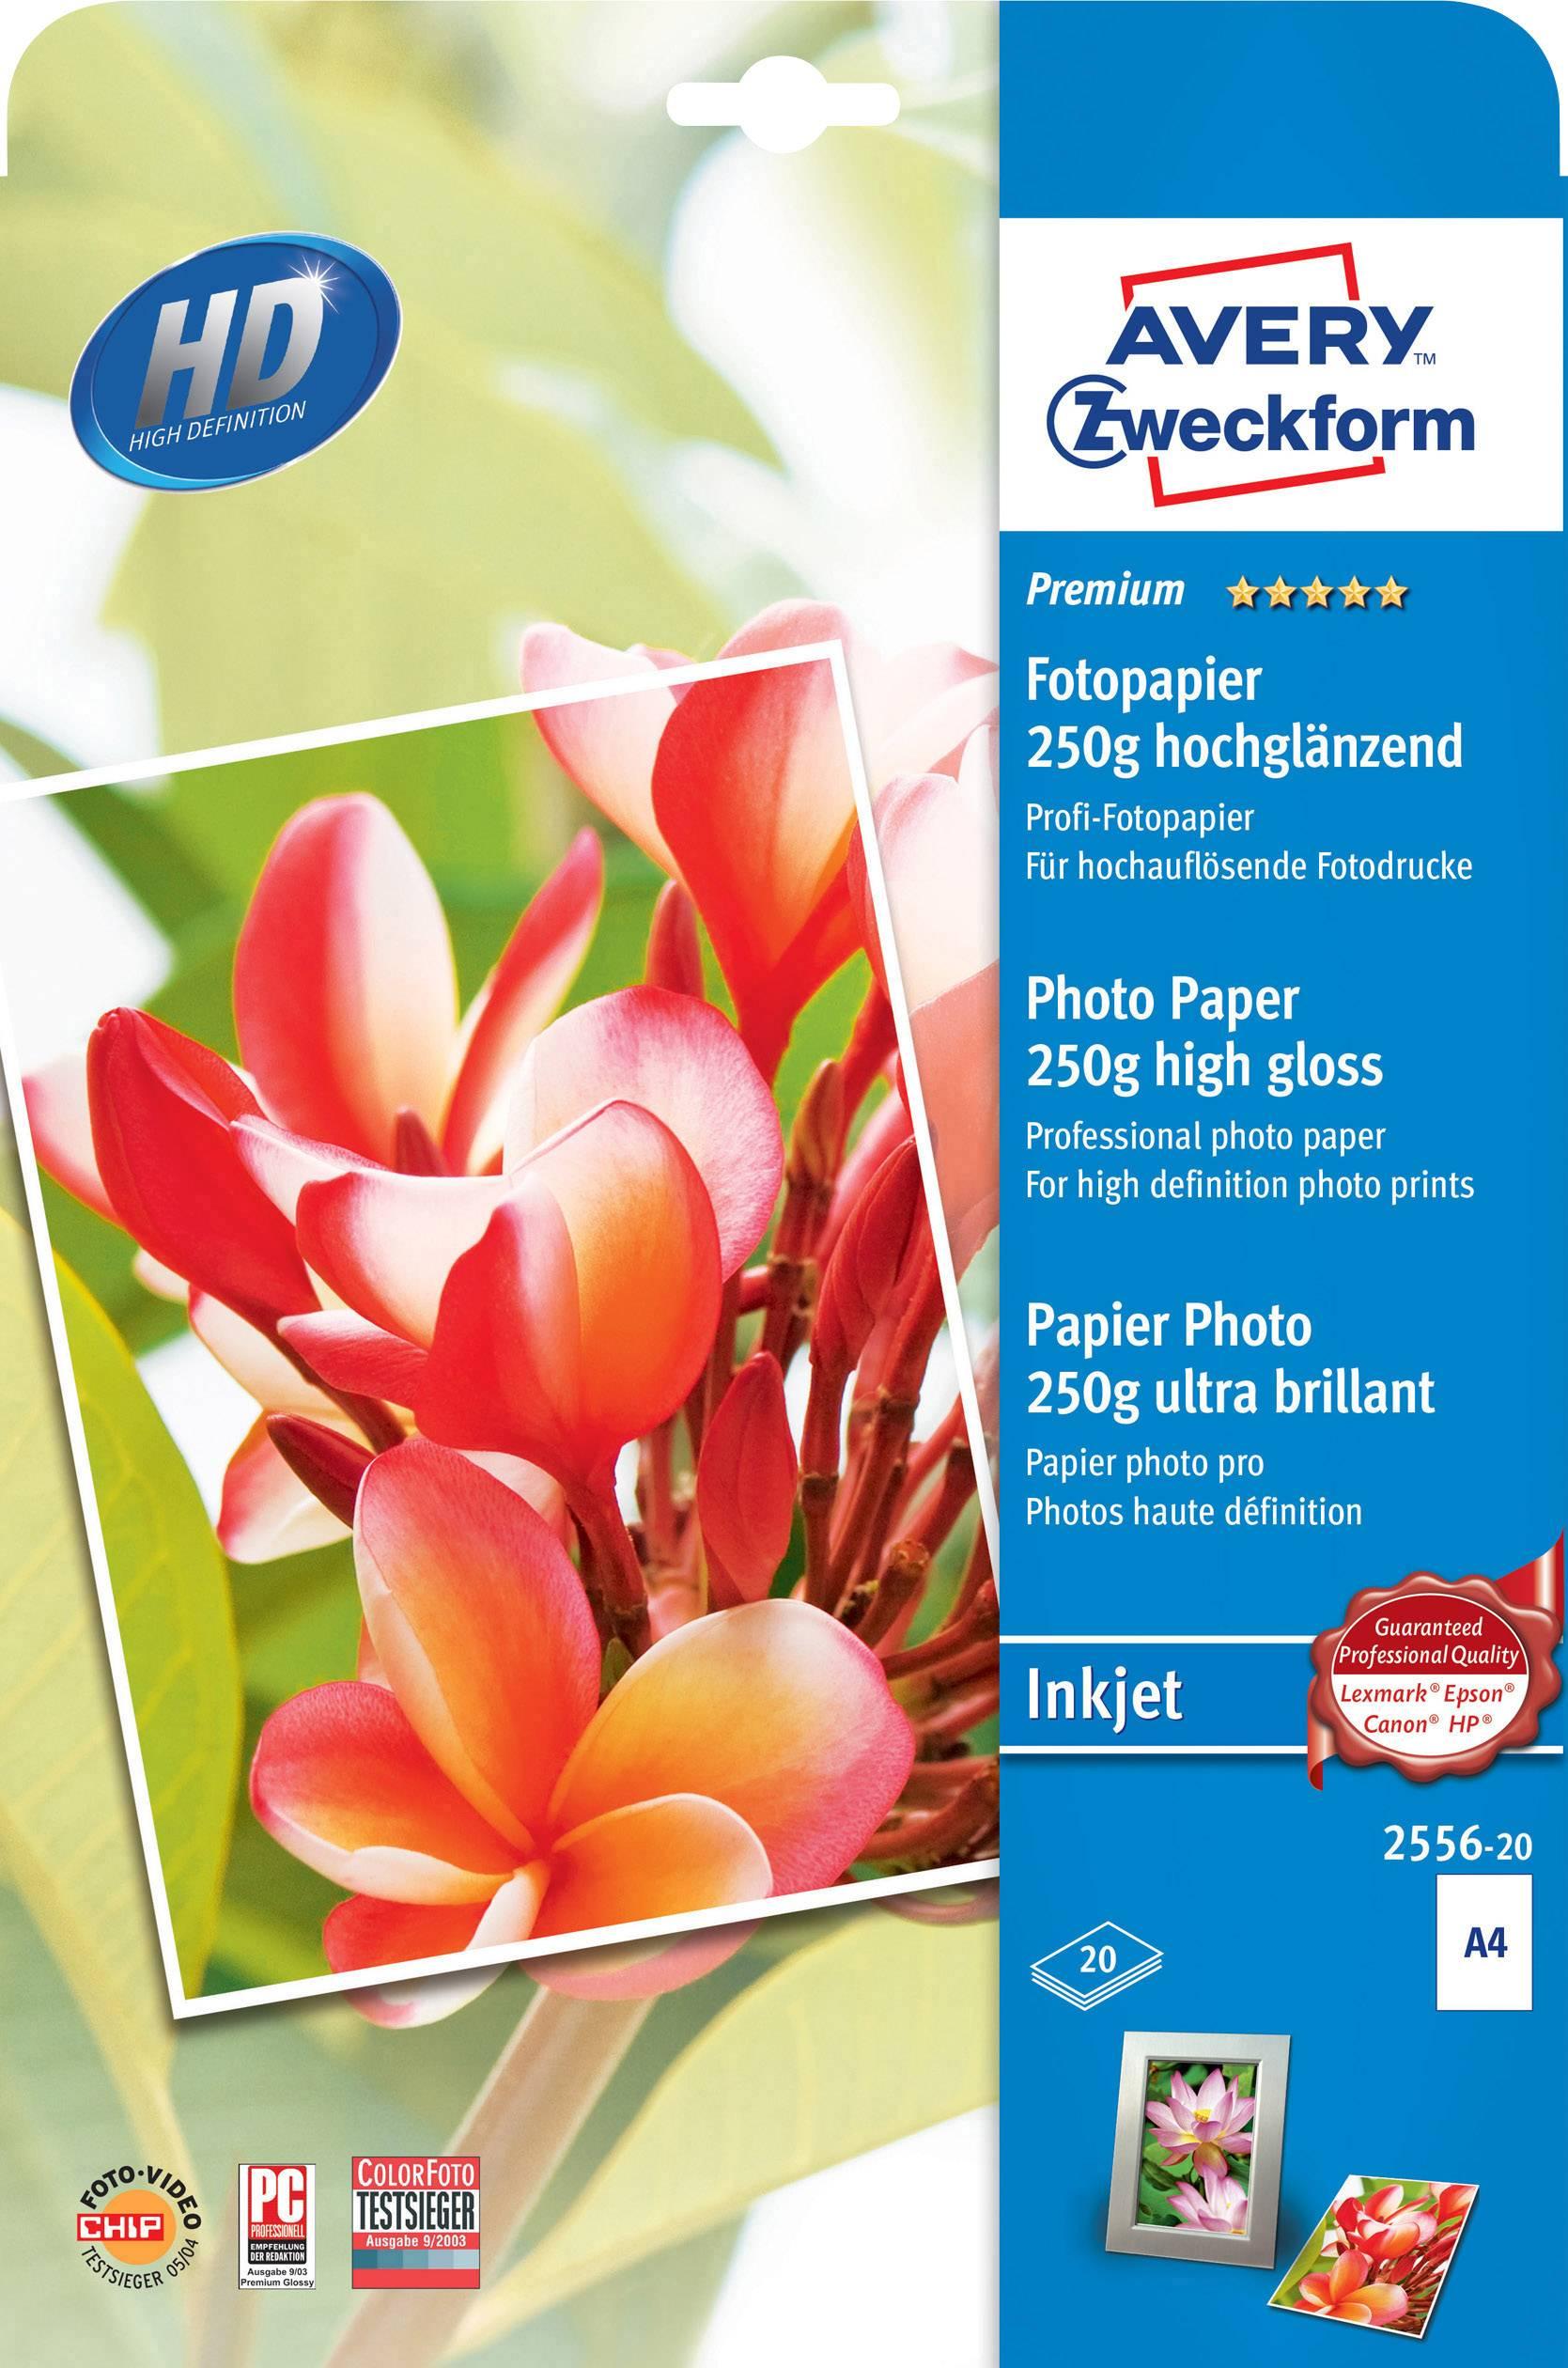 Fotografický papier Avery-Zweckform Premium Photo Paper Inkjet 2556-20, A4, 250 gm², 20 listov